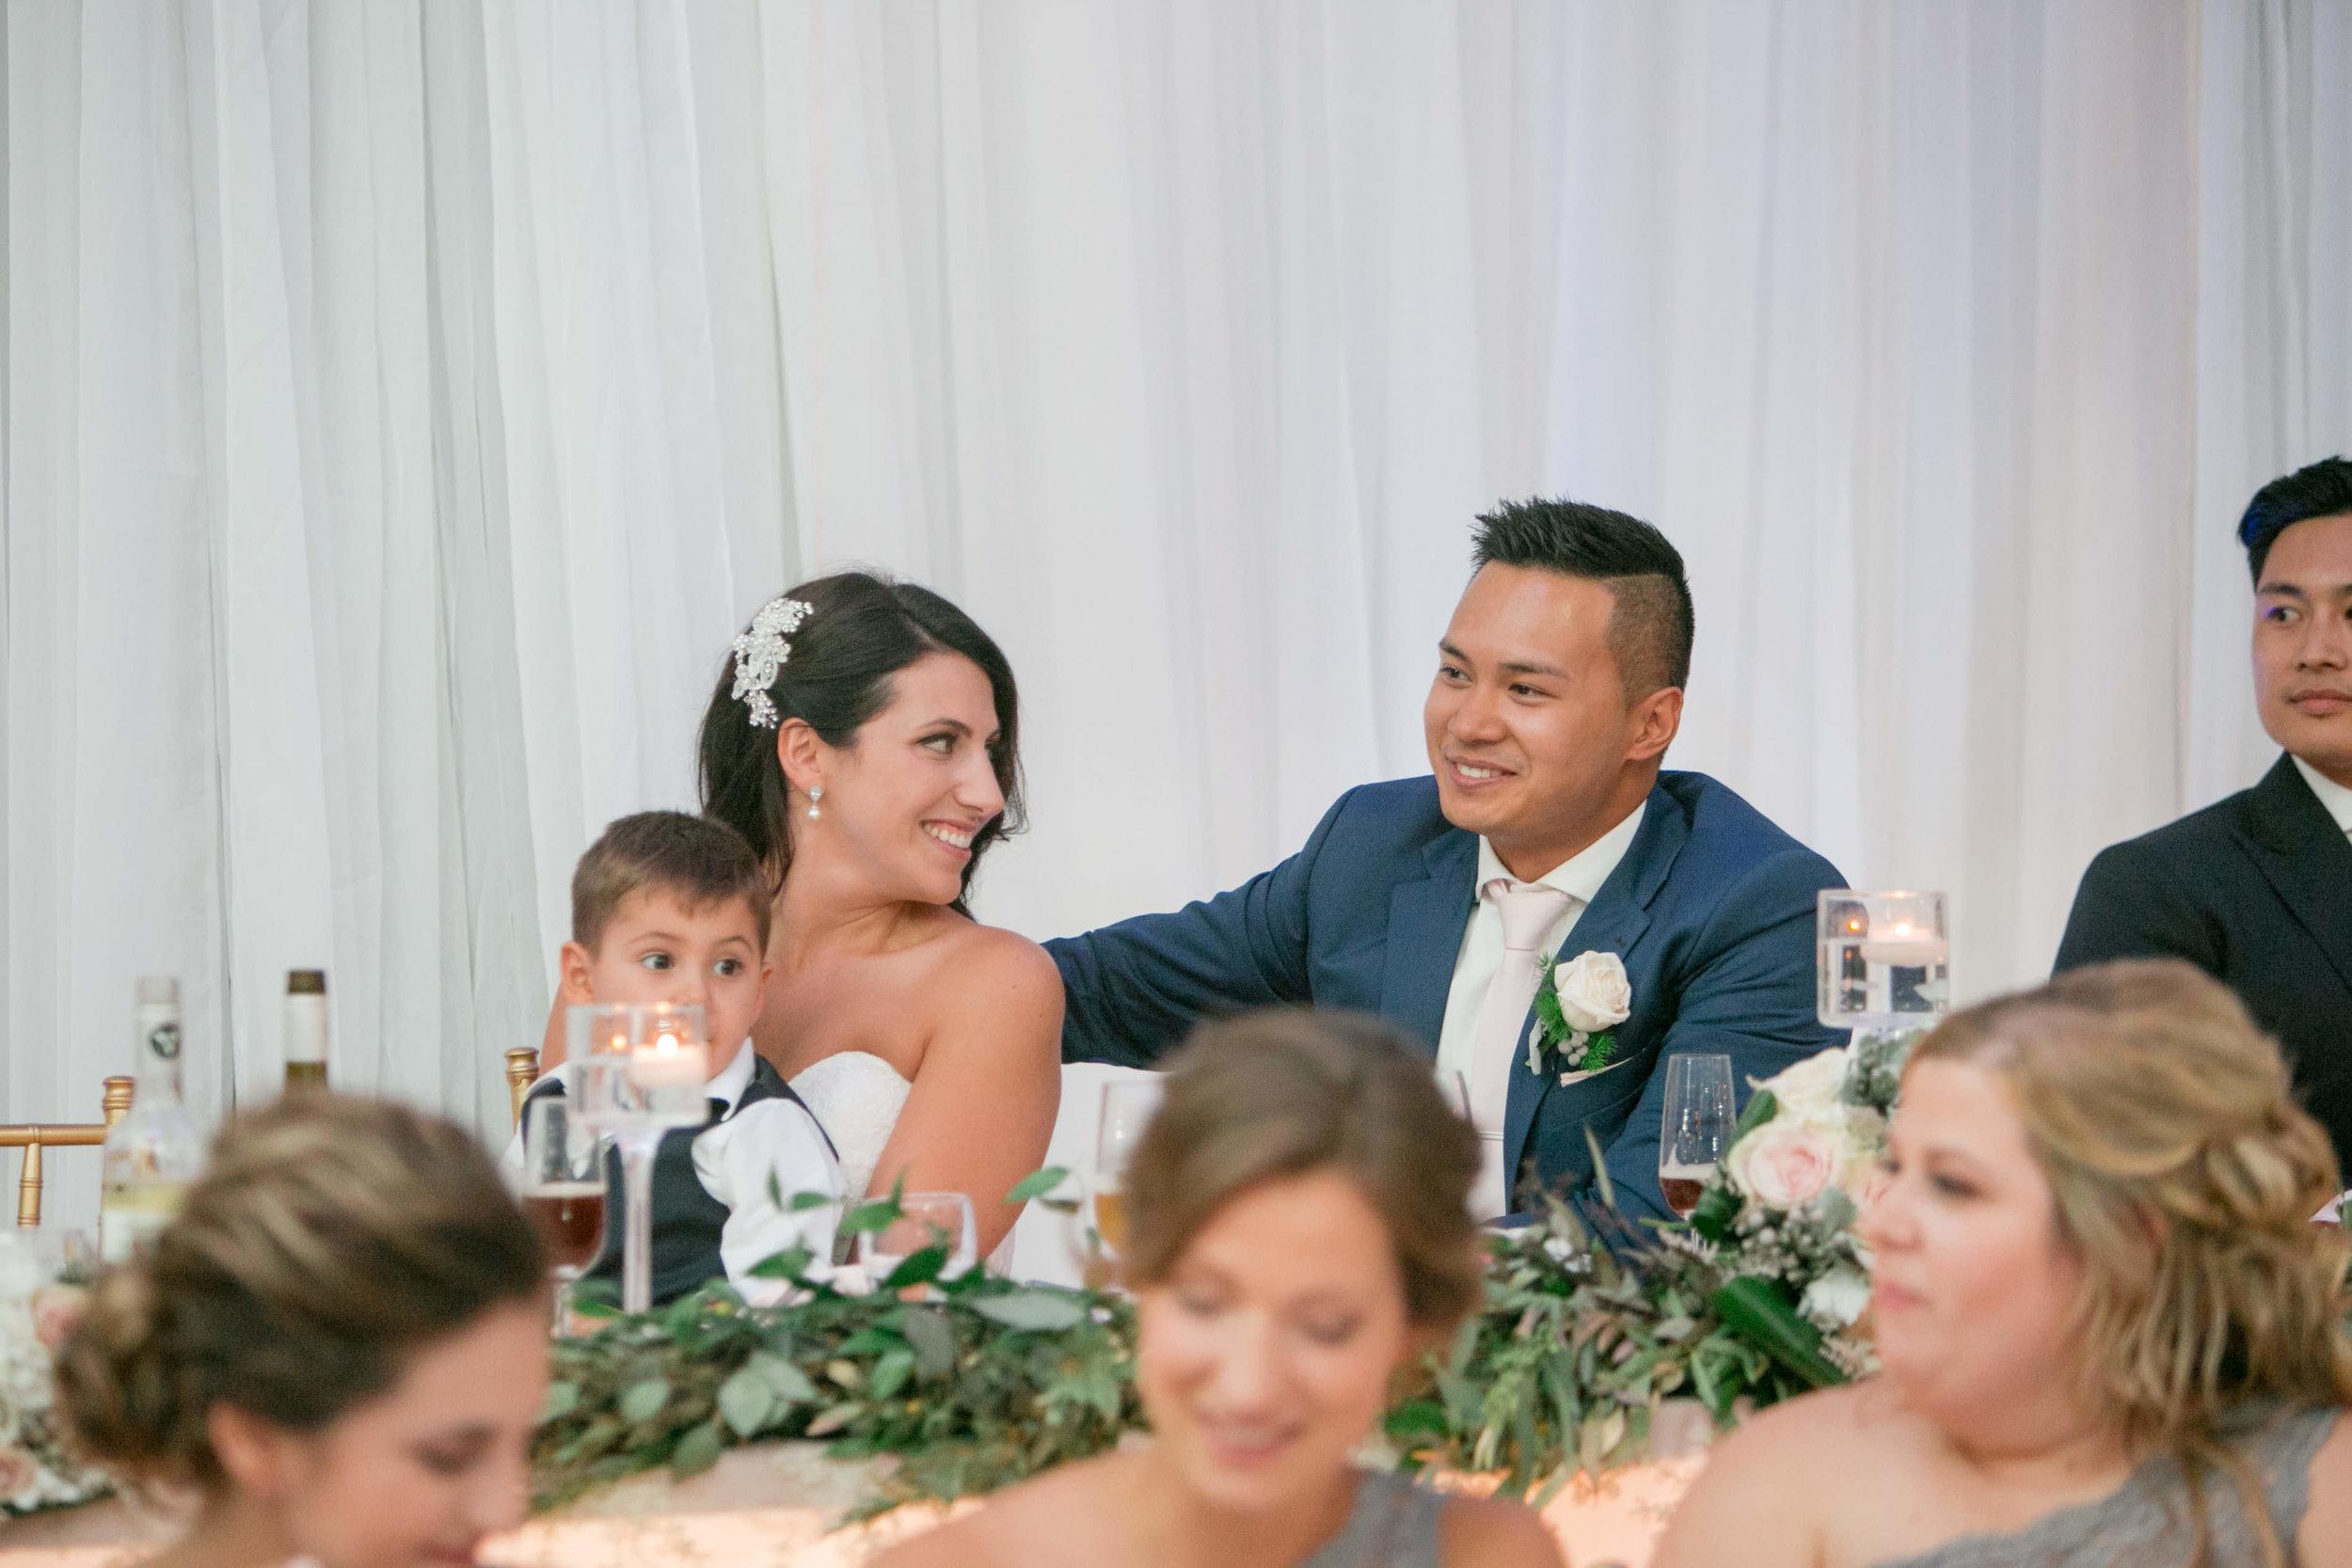 Stefanie___Bernard___Daniel_Ricci_Weddings_High_Res._Finals__567.jpg